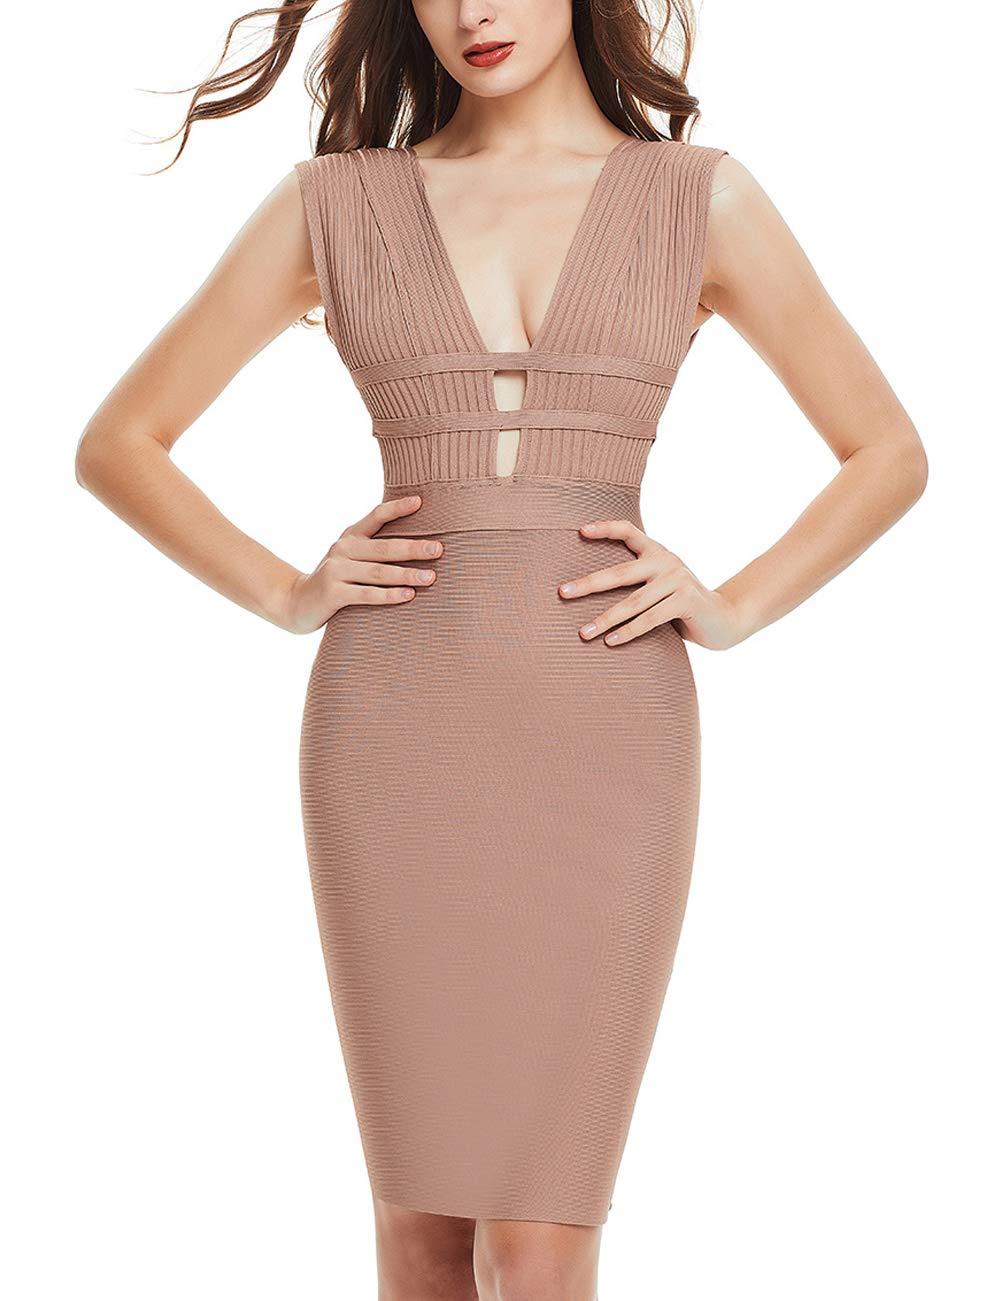 FLYCOOL Women's Sexy Slim Bodycon Backless Club Deep V Bandage Sleeveless Dress